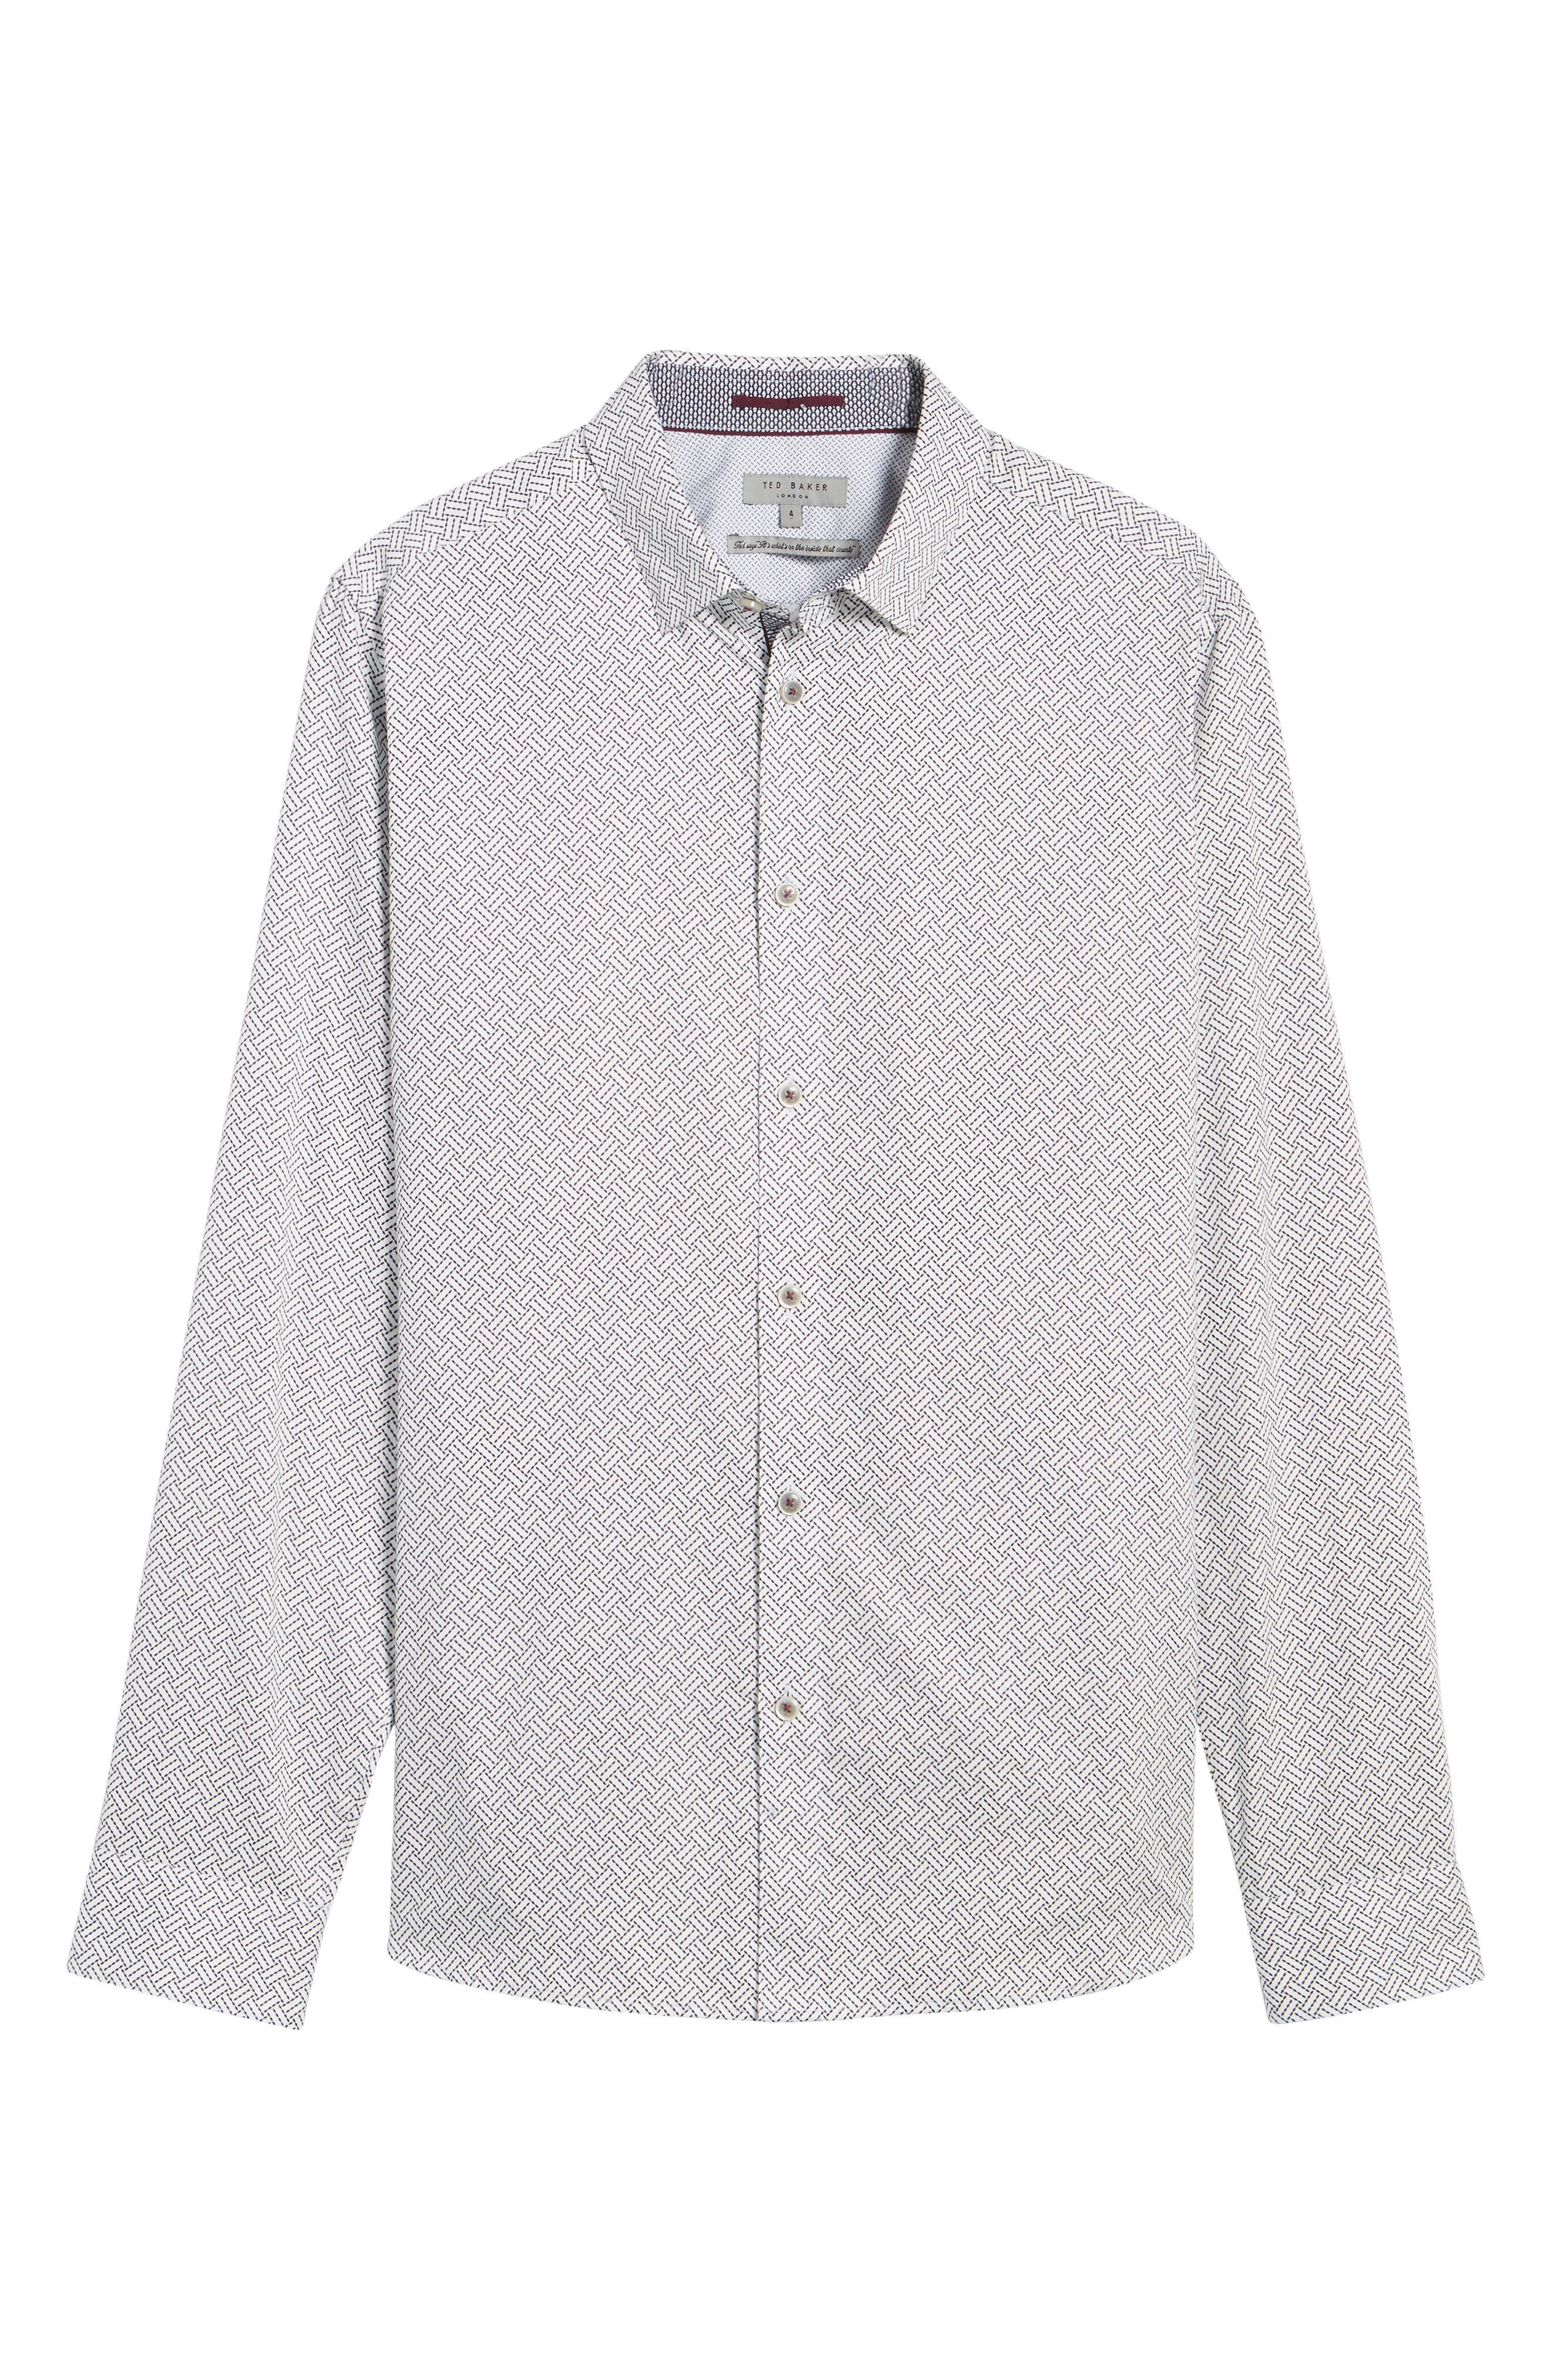 Larosh Slim Fit Basket Weave Print Sport Shirt,                             Alternate thumbnail 6, color,                             110